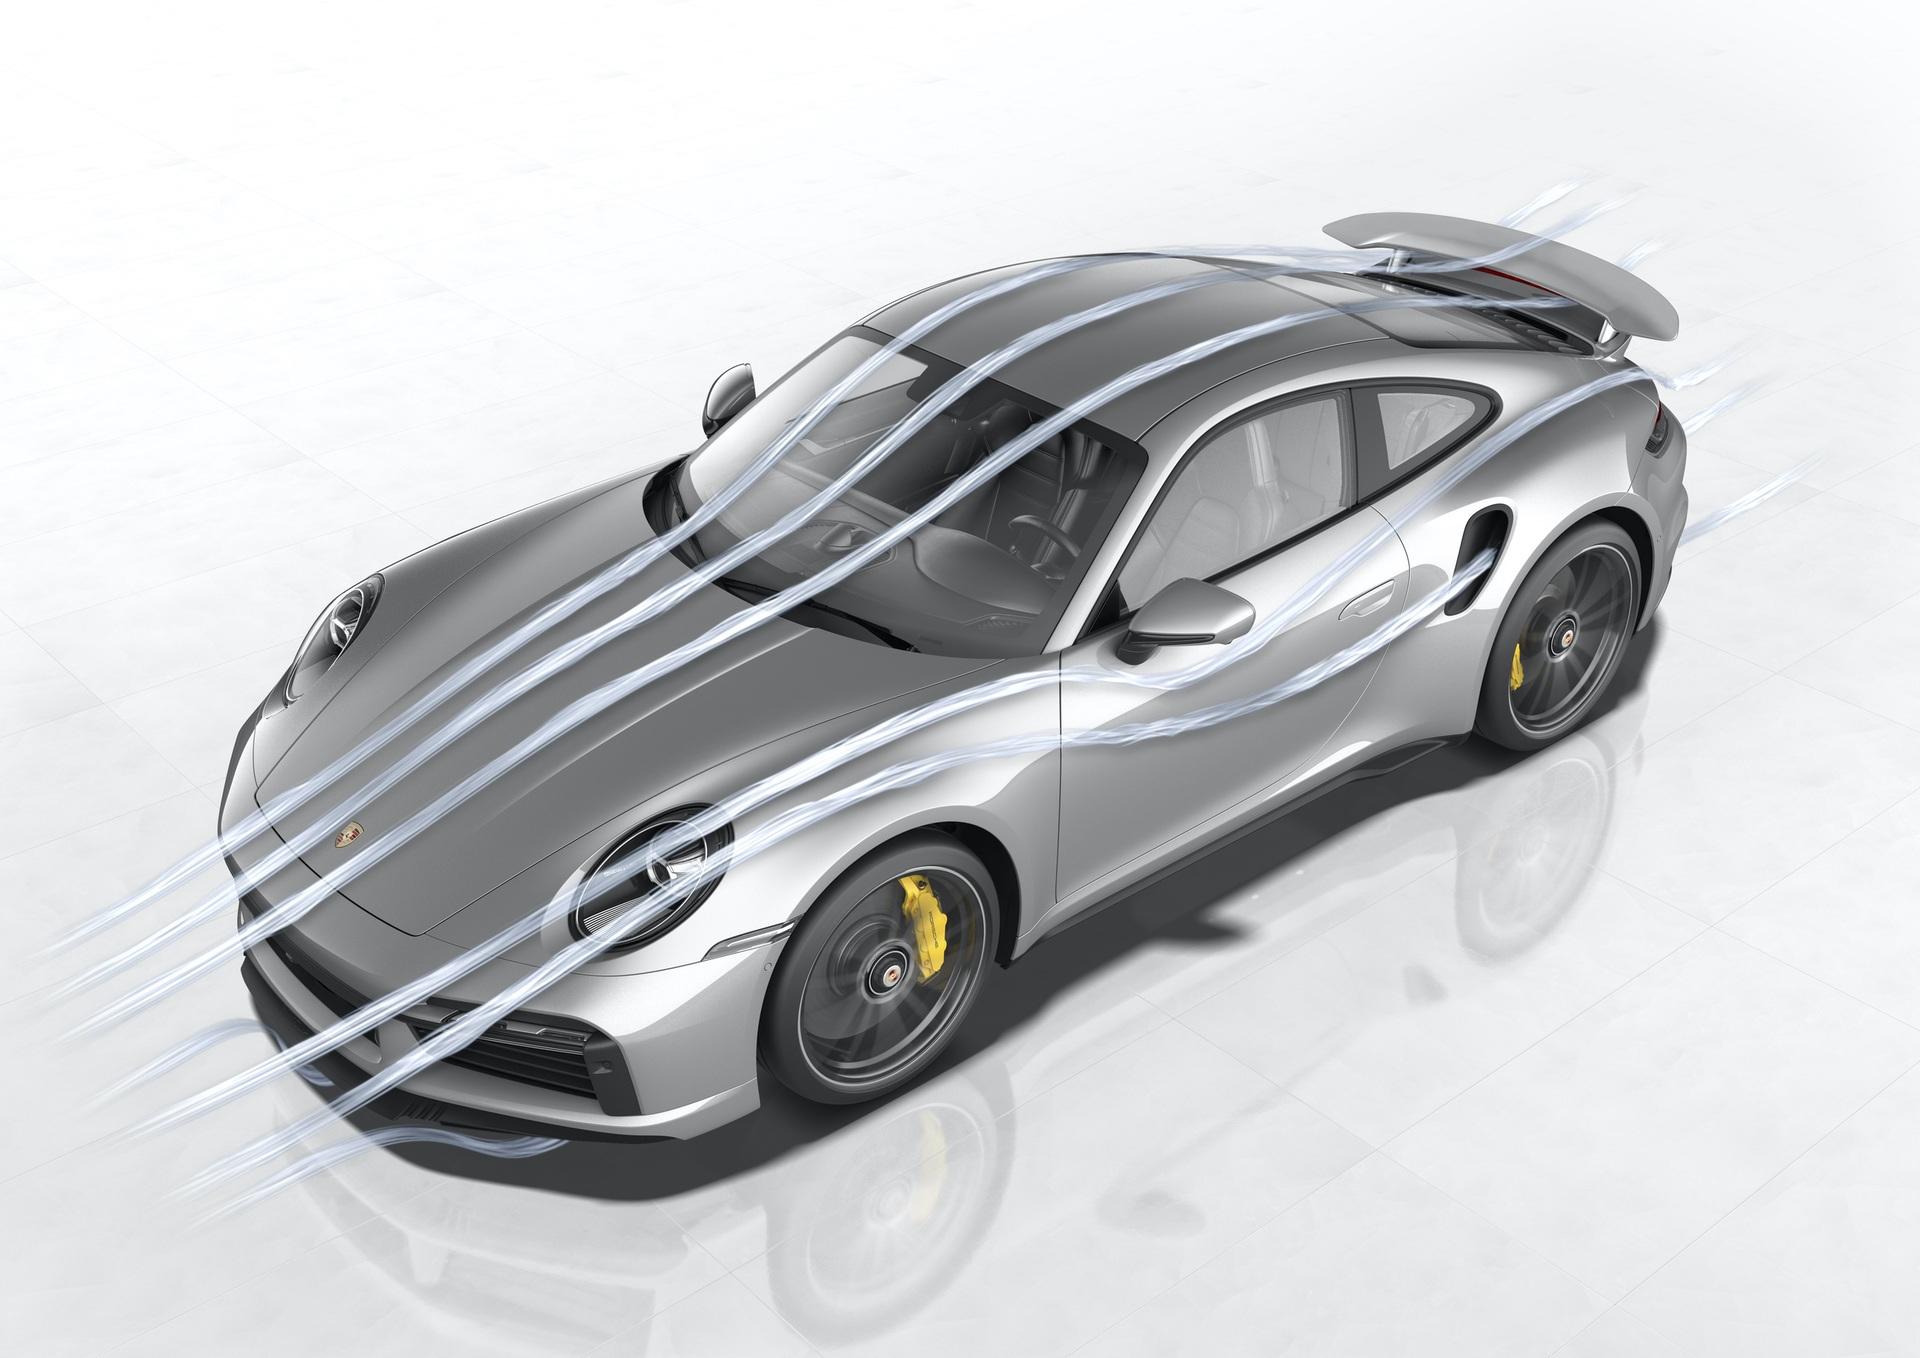 2020_Porsche_911-Turbo_S-aerodynamics_0009